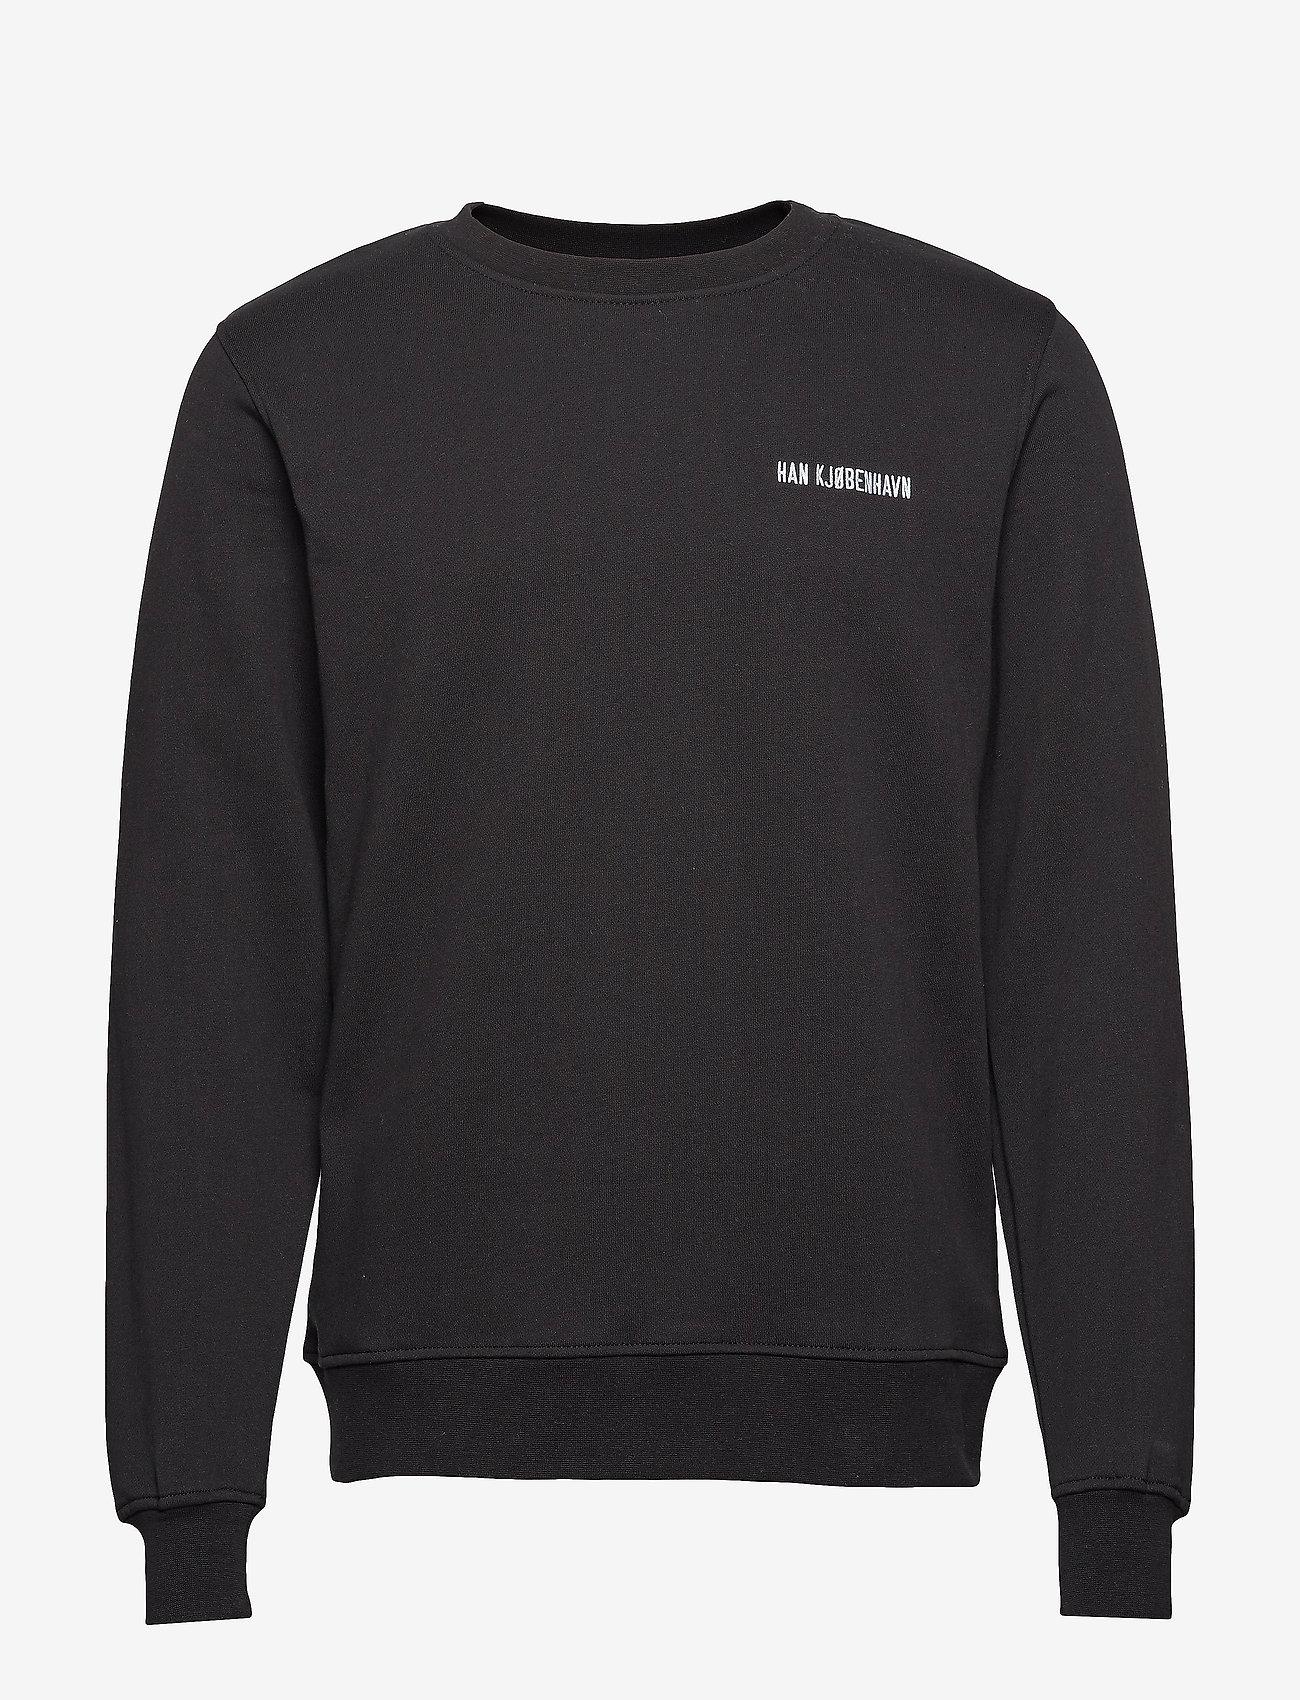 HAN Kjøbenhavn Casual Crew - Sweatshirts BLACK - Menn Klær